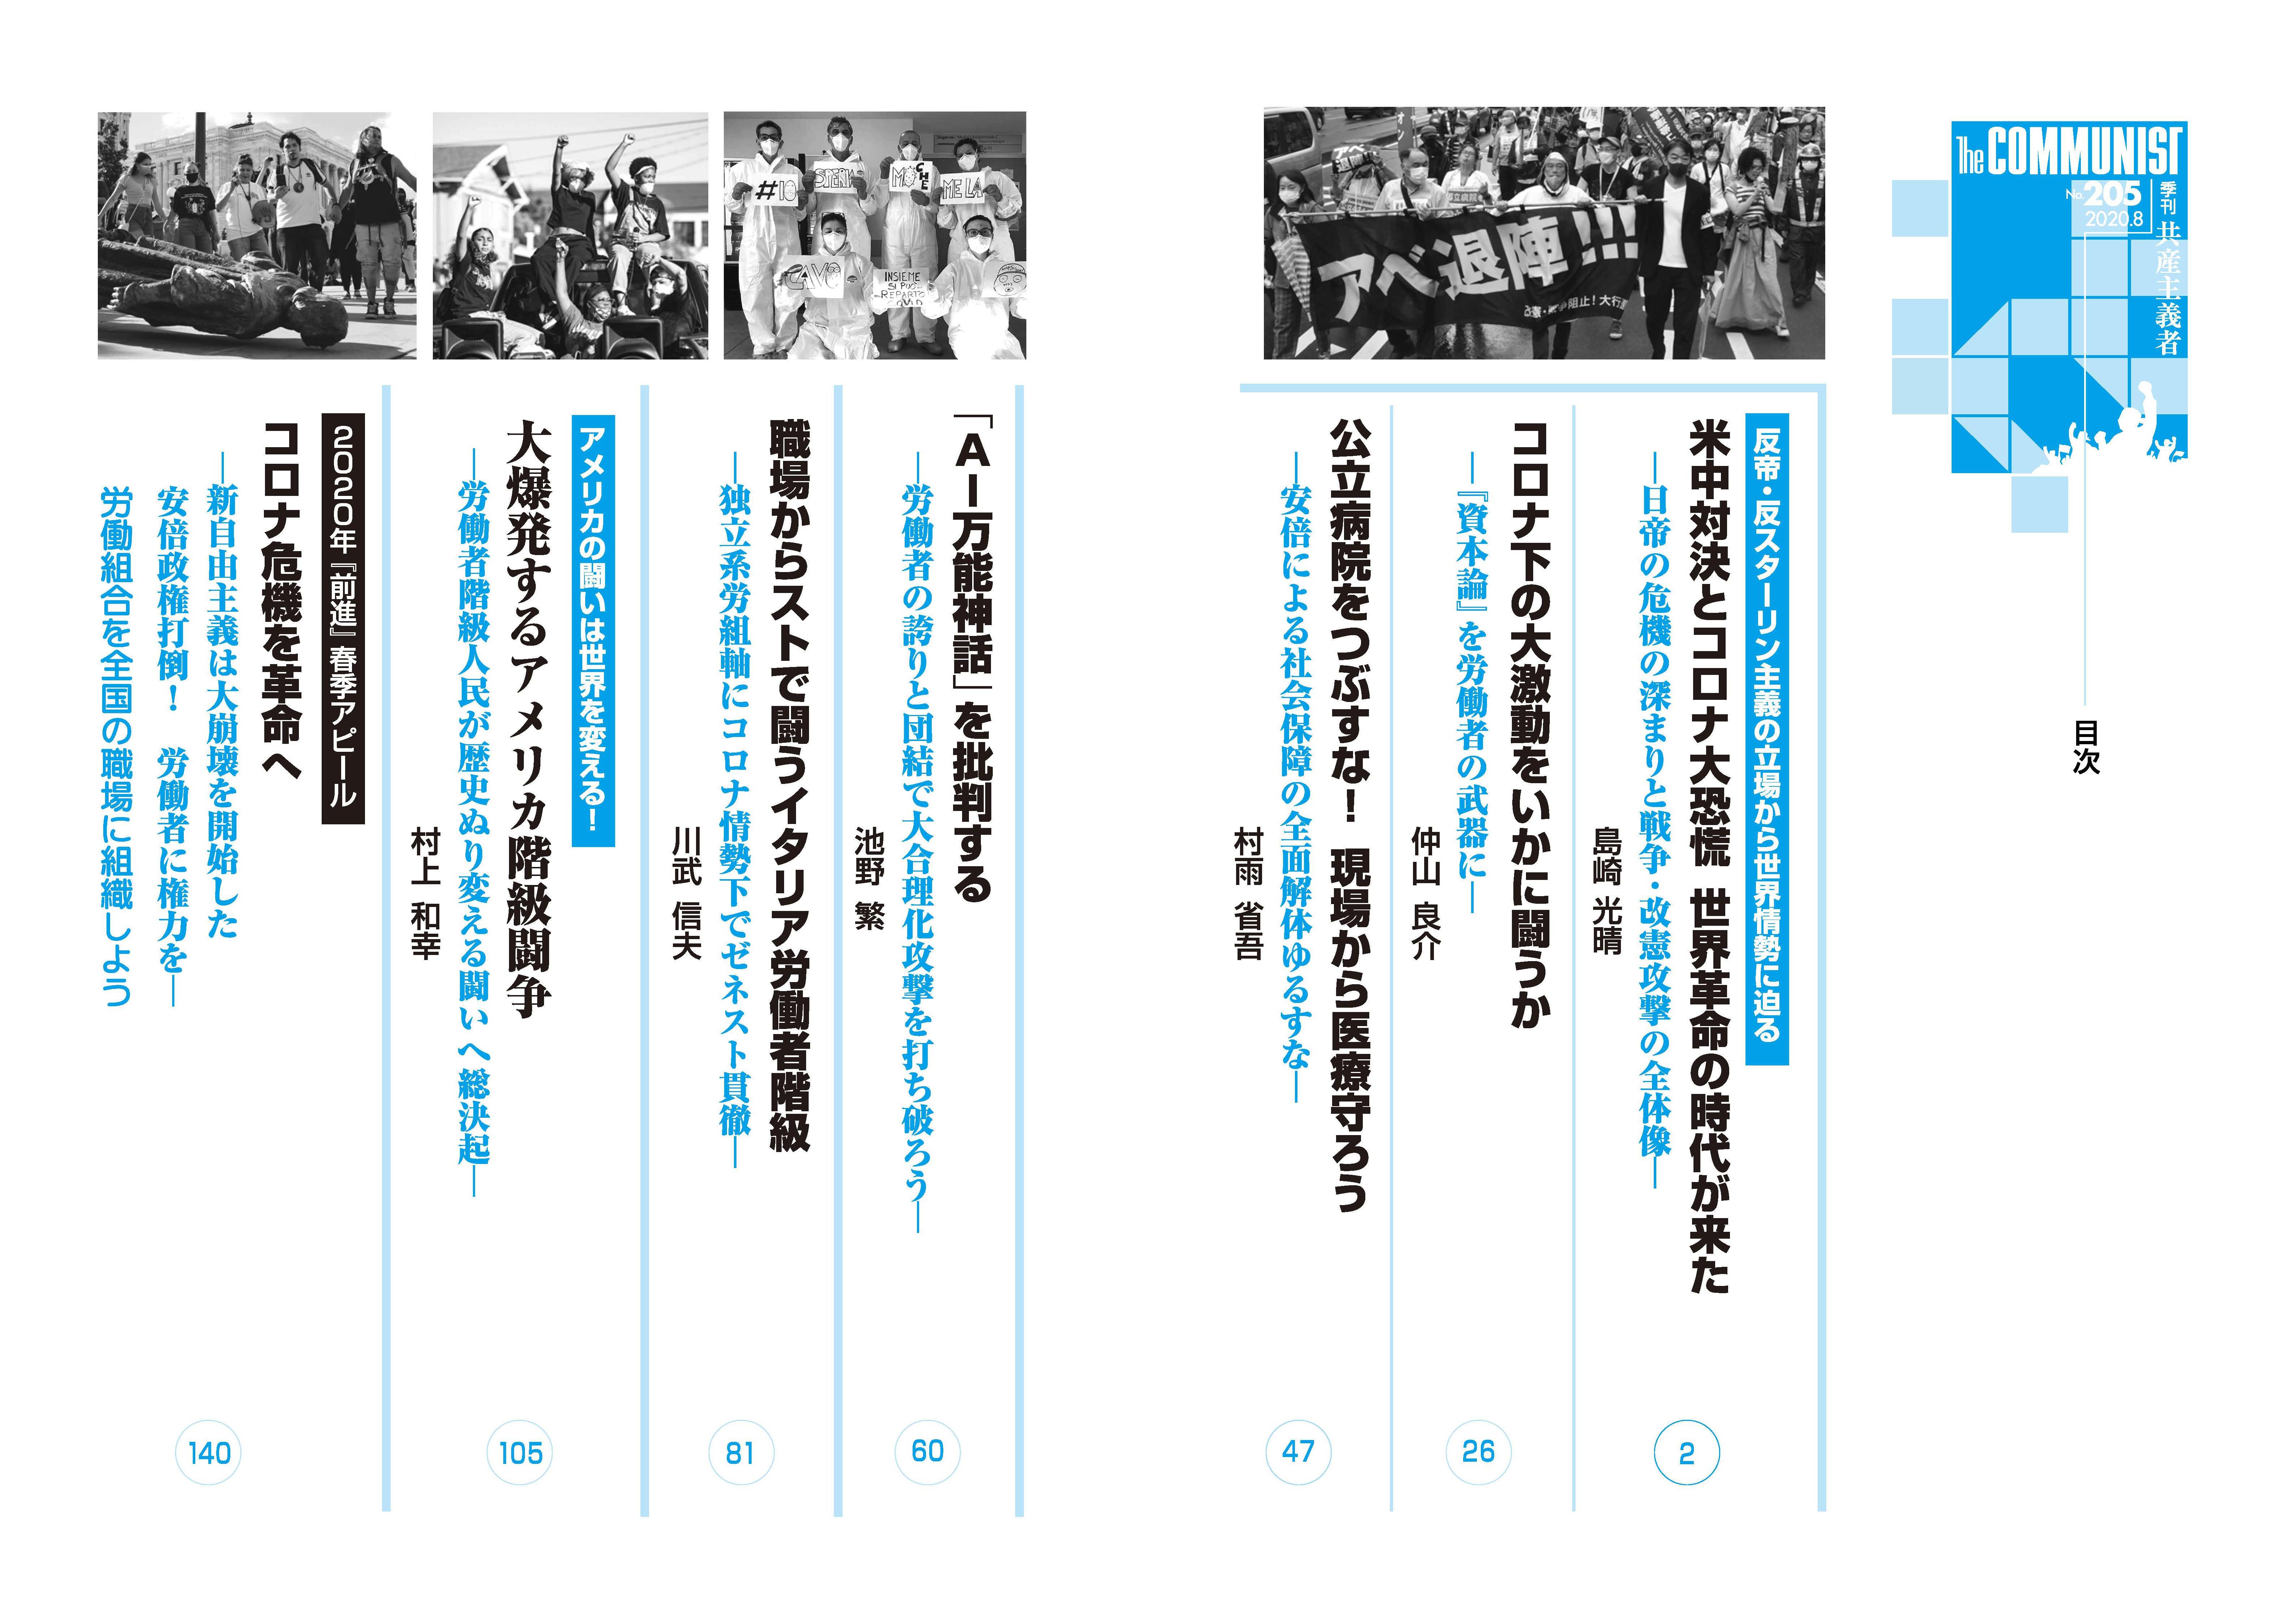 http://www.zenshin.org/zh/ist/%E3%82%A4%E3%82%B9%E3%83%88205%E5%8F%B7%E7%9B%AE%E6%AC%A1%EF%BC%88%E9%9D%92%E7%94%A8%EF%BC%89.jpg